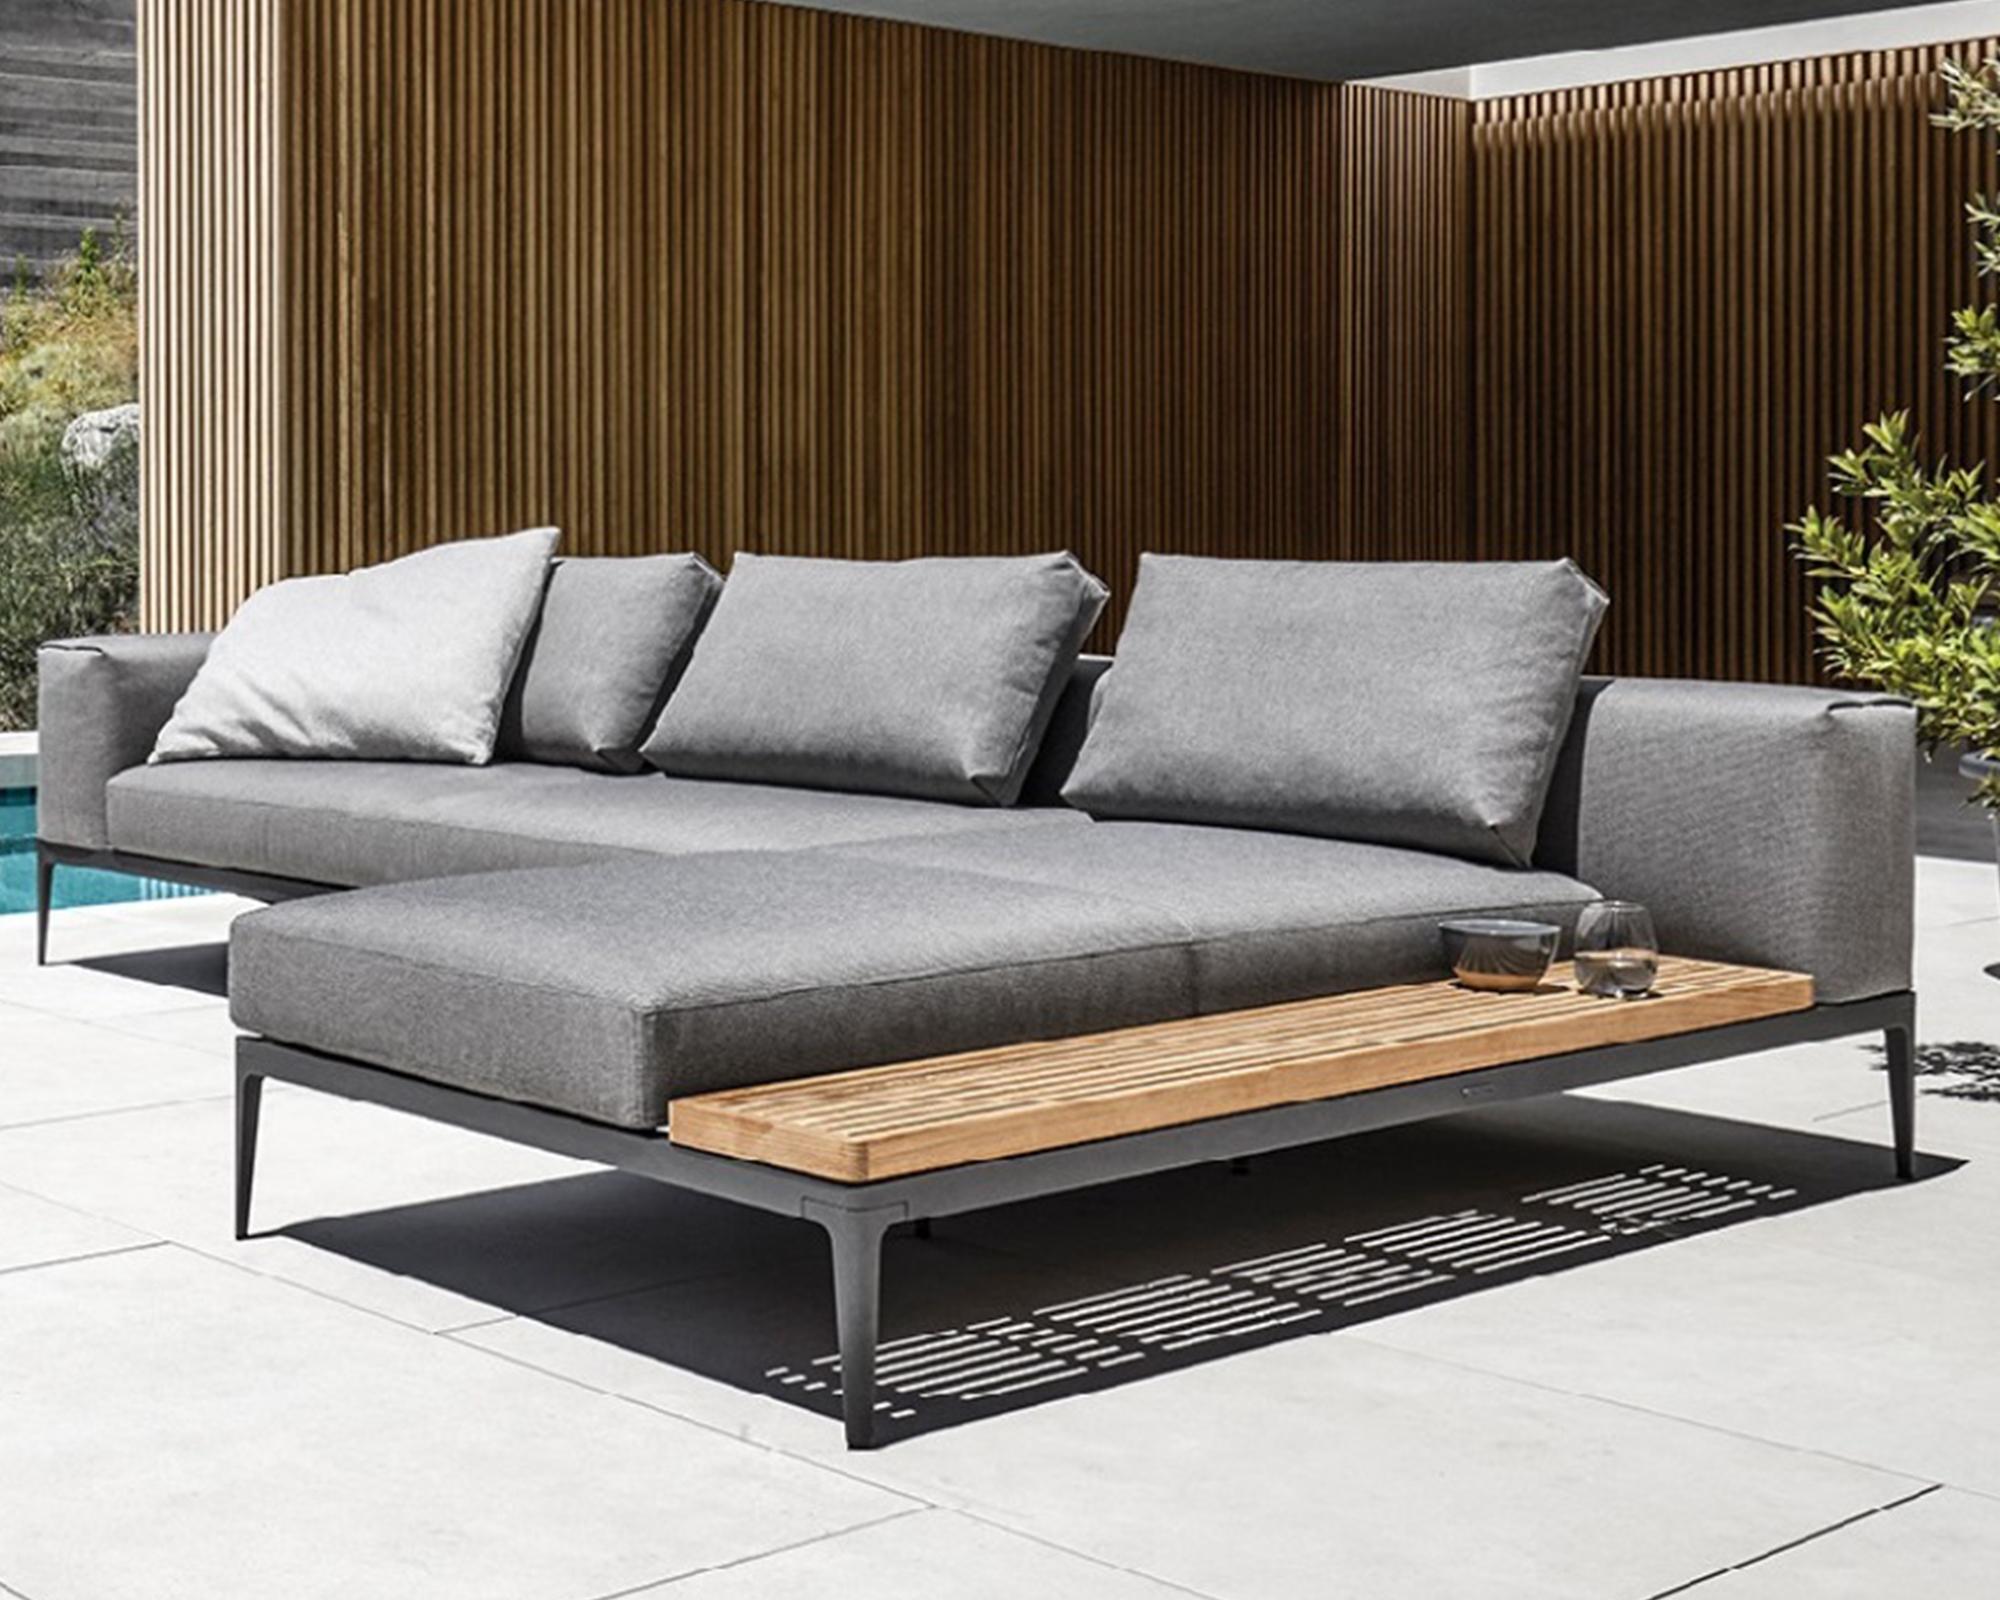 garten lounge set grid chaiselounge endeinheit gloster. Black Bedroom Furniture Sets. Home Design Ideas